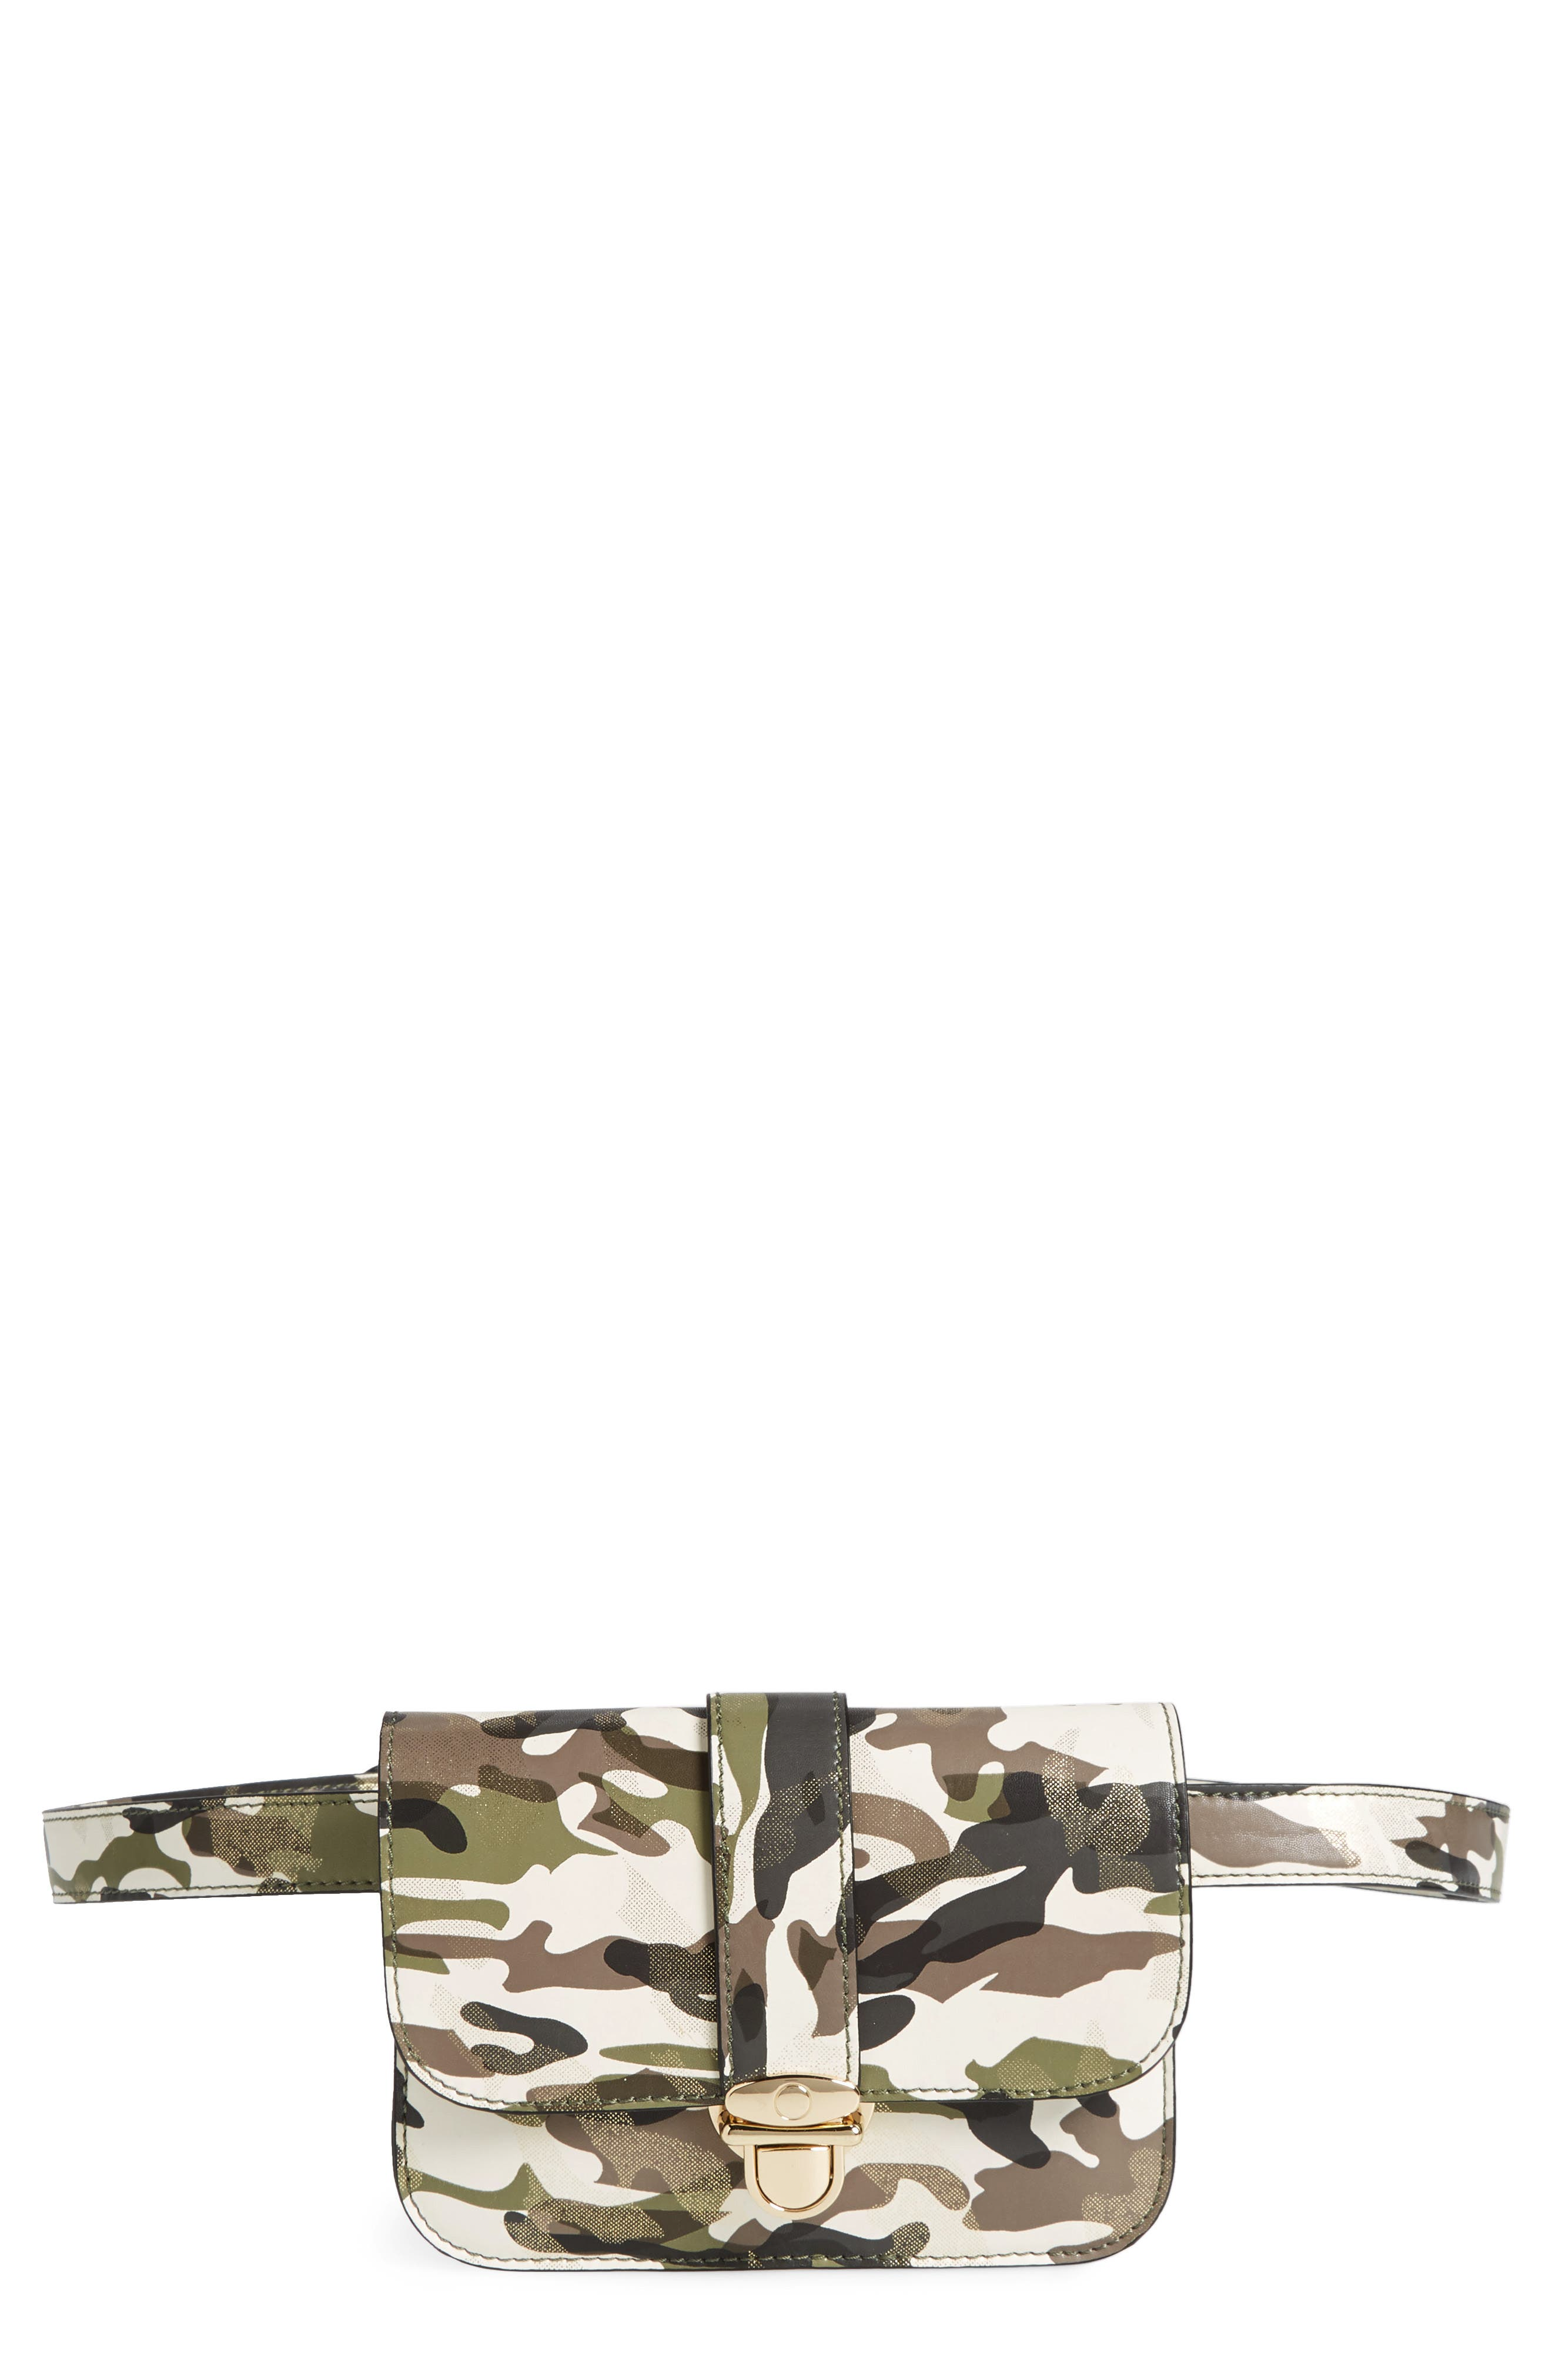 Mali + Lili Stella Camouflage Vegan Leather Crossbody Belt Bag